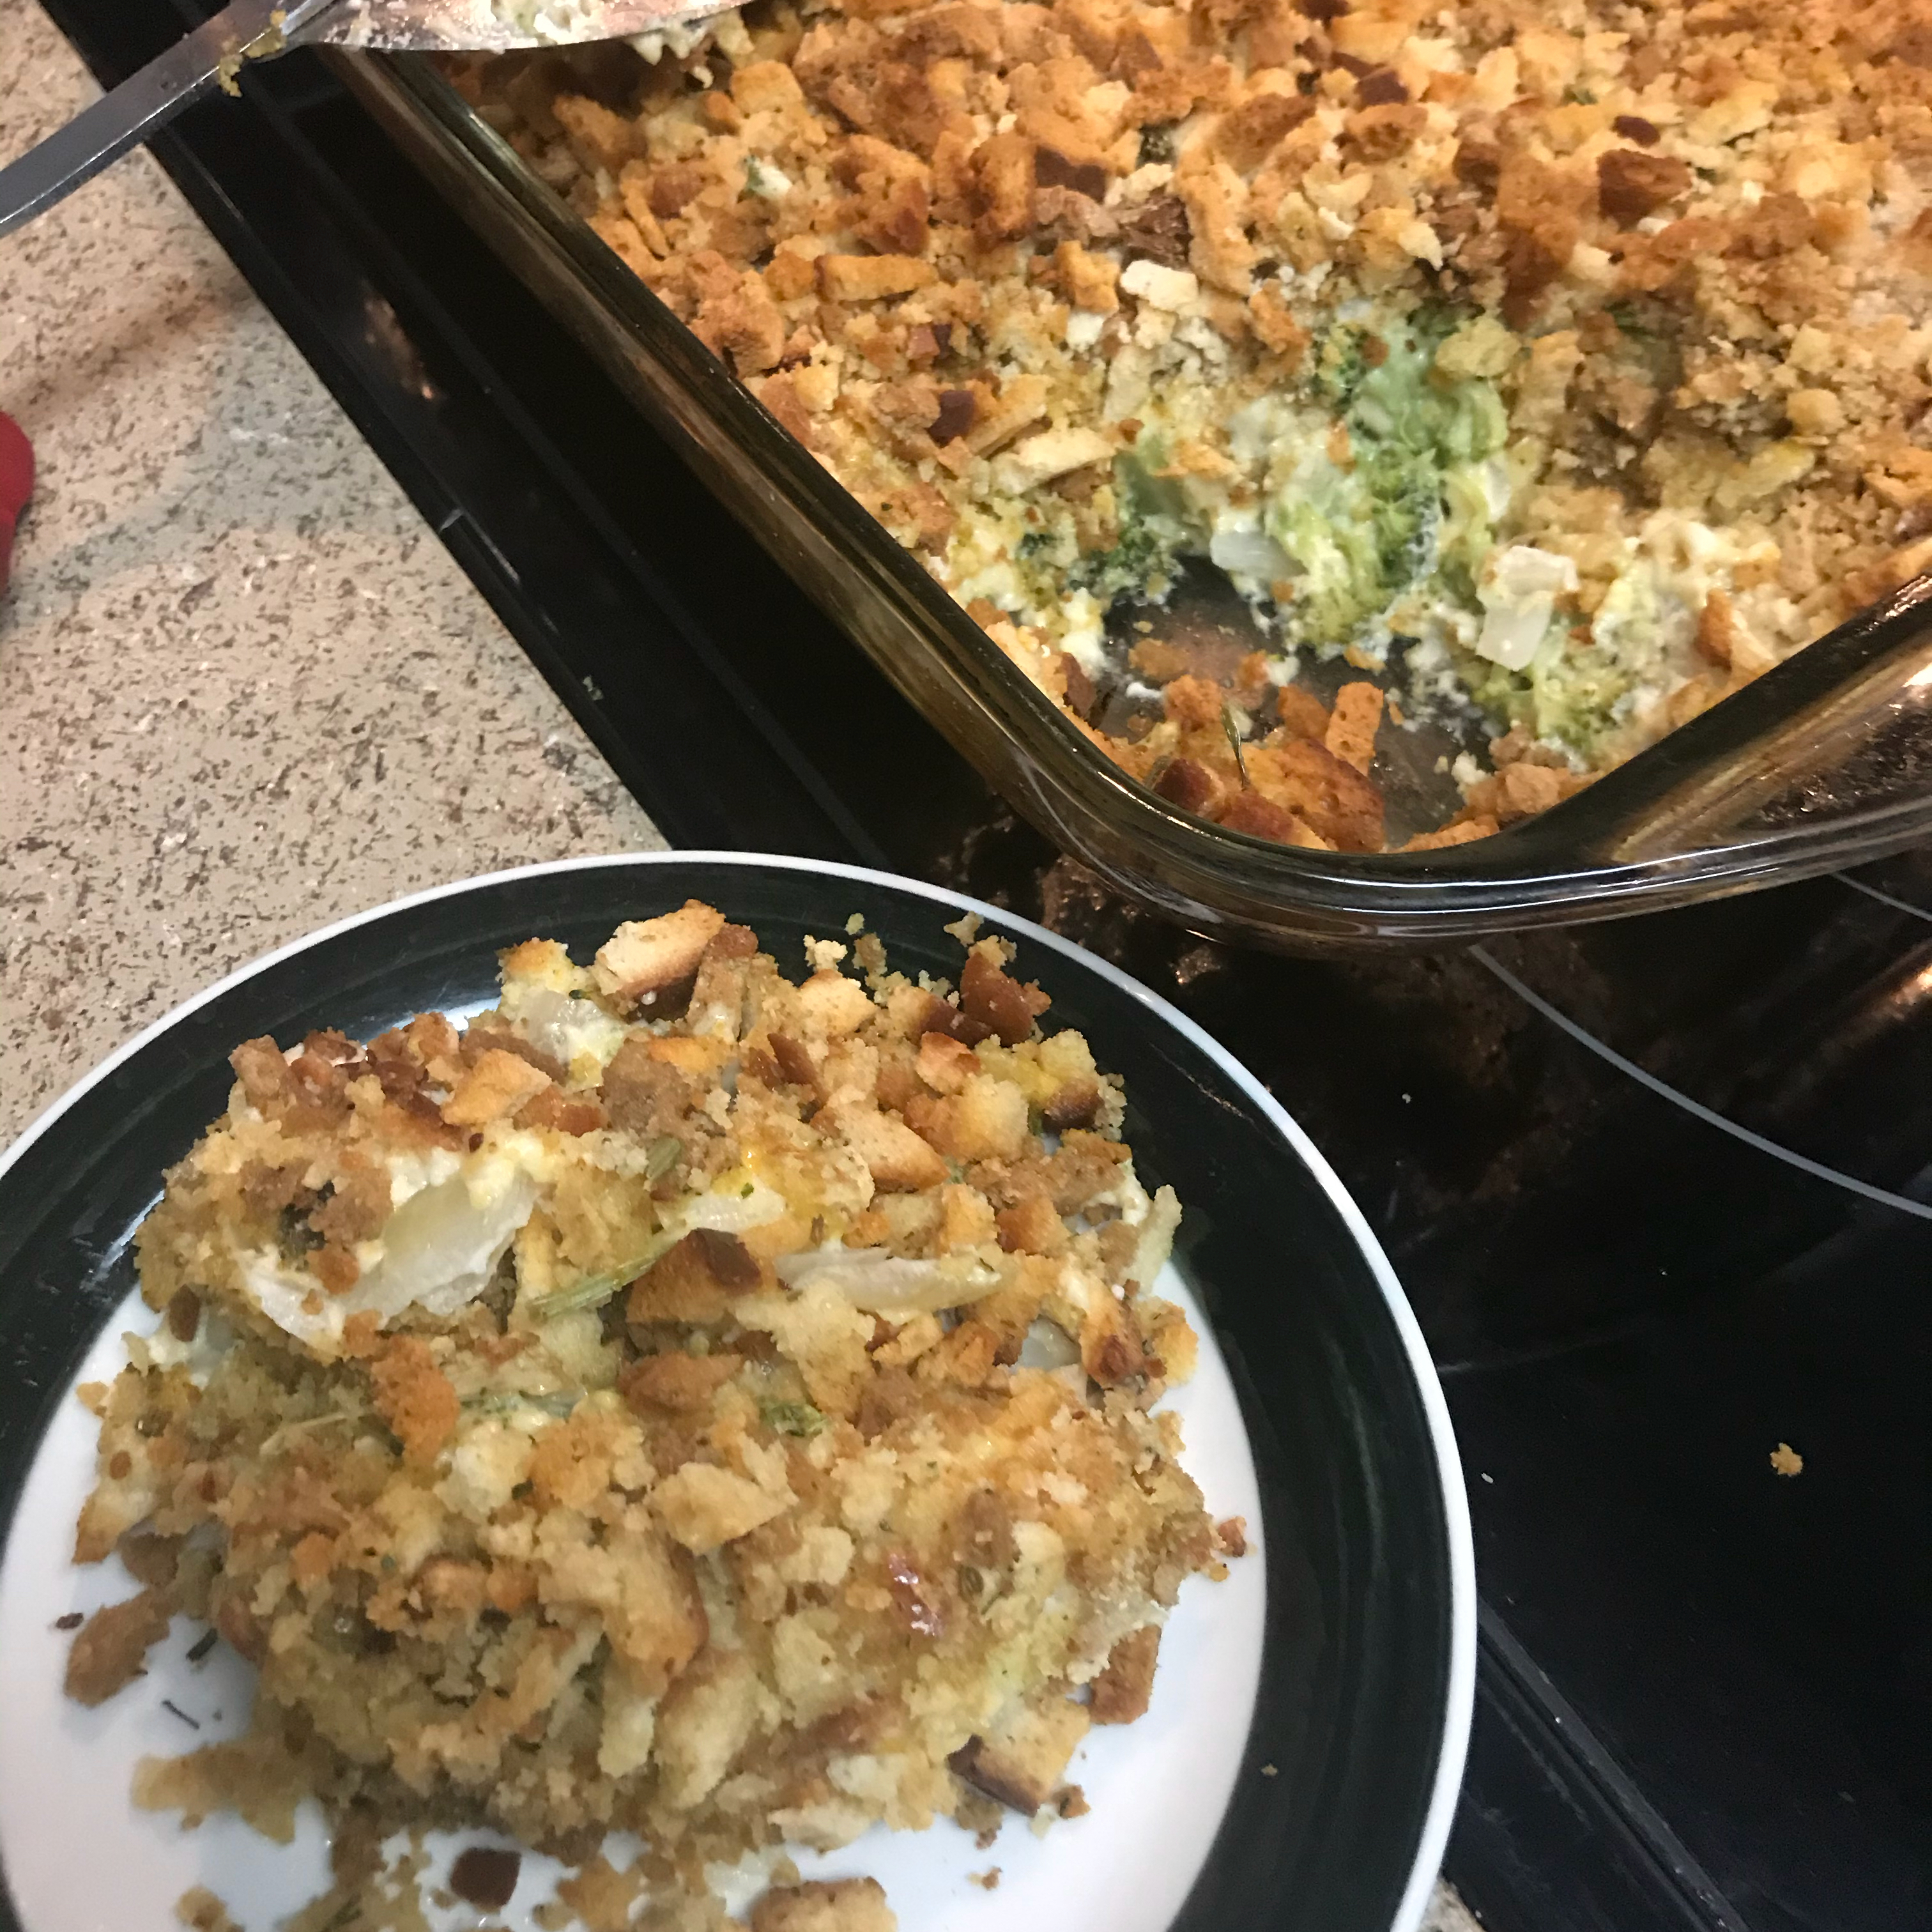 Broccoli Stuffing